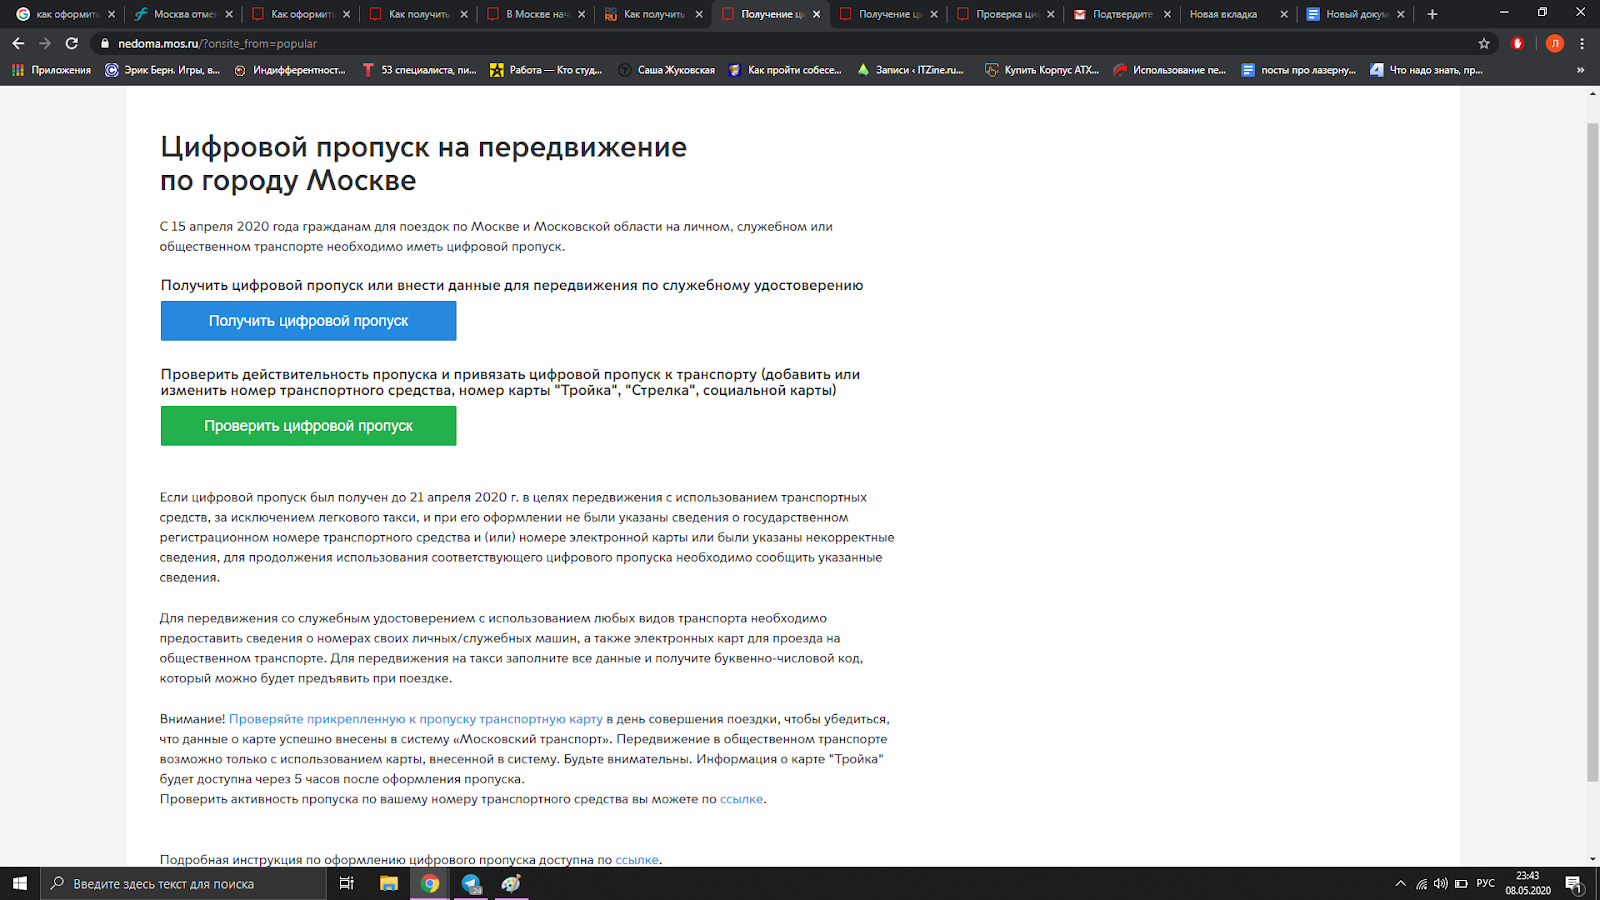 Инструкция. Как оформить цифровой пропуск в Москве. Все способы (gFtOaD gXIFNgD965b4XcdjczMqqDpG7vnEcwgTYndwjogkiBdzJ2k6 qW6 ZBoWW6Q w9g0Hk4BpwrN4uihwx2C QFkNlj2qZzf2KMdsdQHKawIz3itf6wyiNK RYMhH jOwr1F)